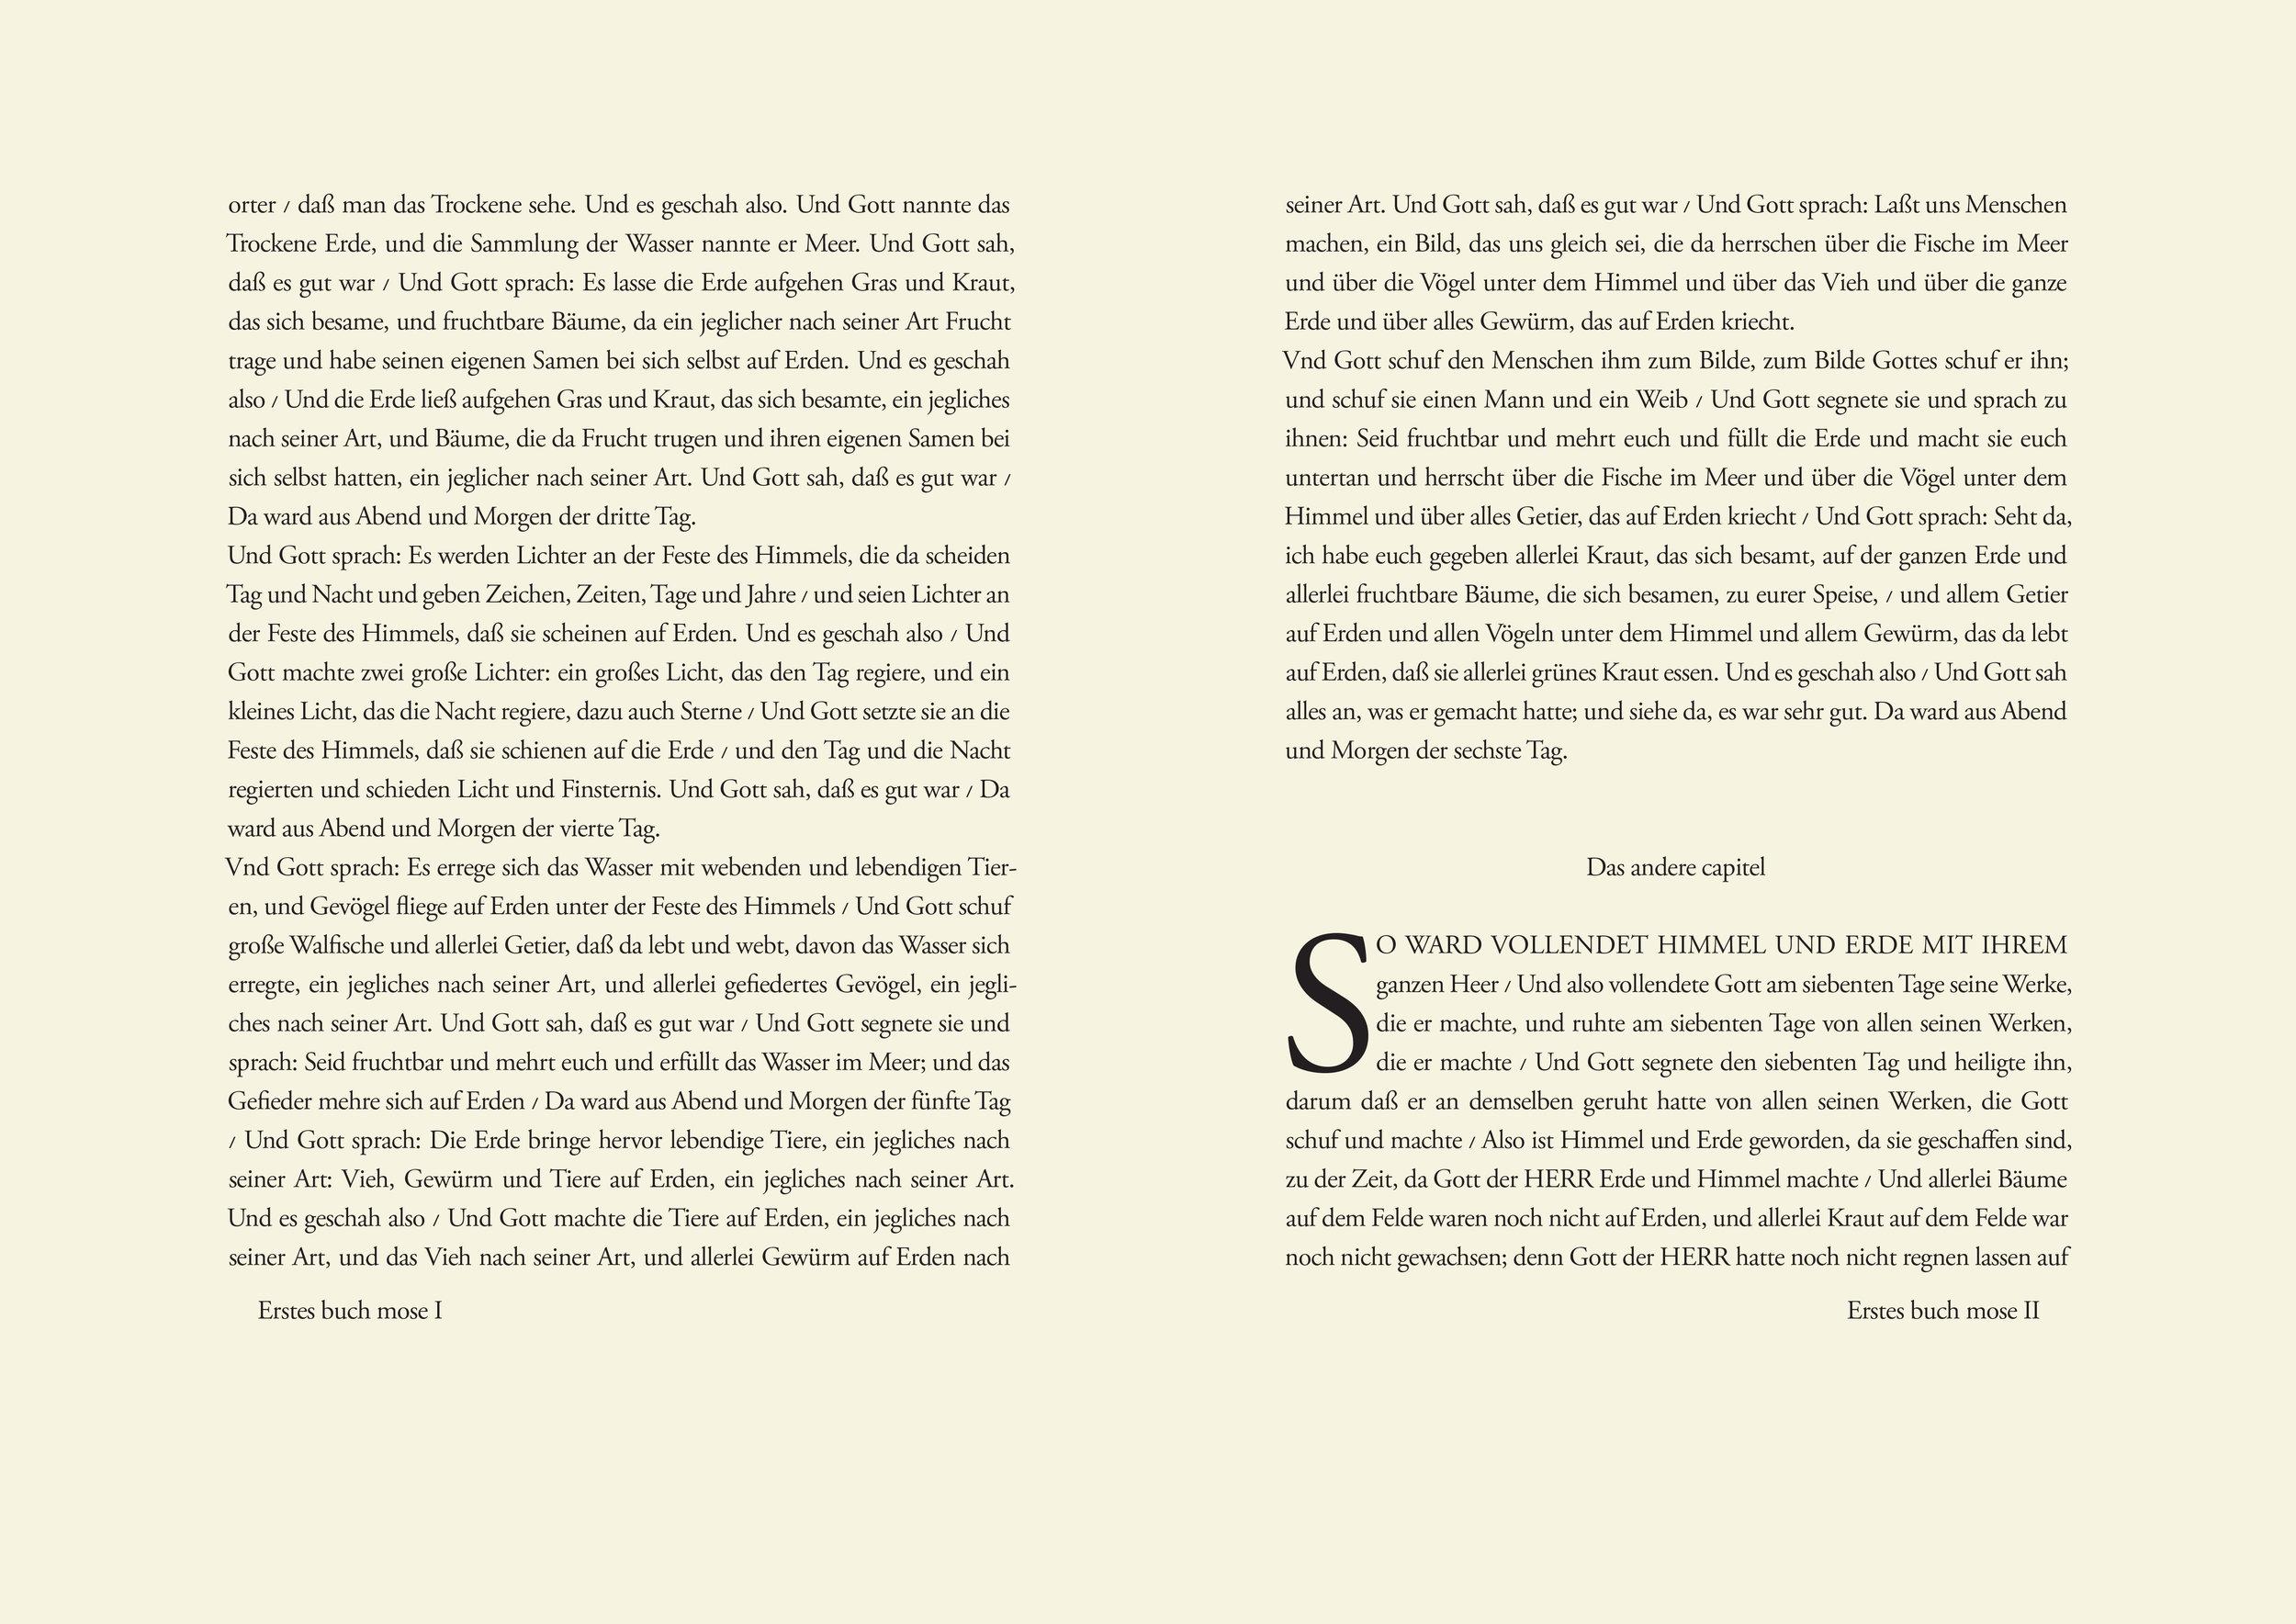 RICHARD VON SICHOWSKY  Hamburg, Germany, 1955  Garamond, Trajan  22.7 X 32.1 cm  Letterpress  Liber Librorum Collection